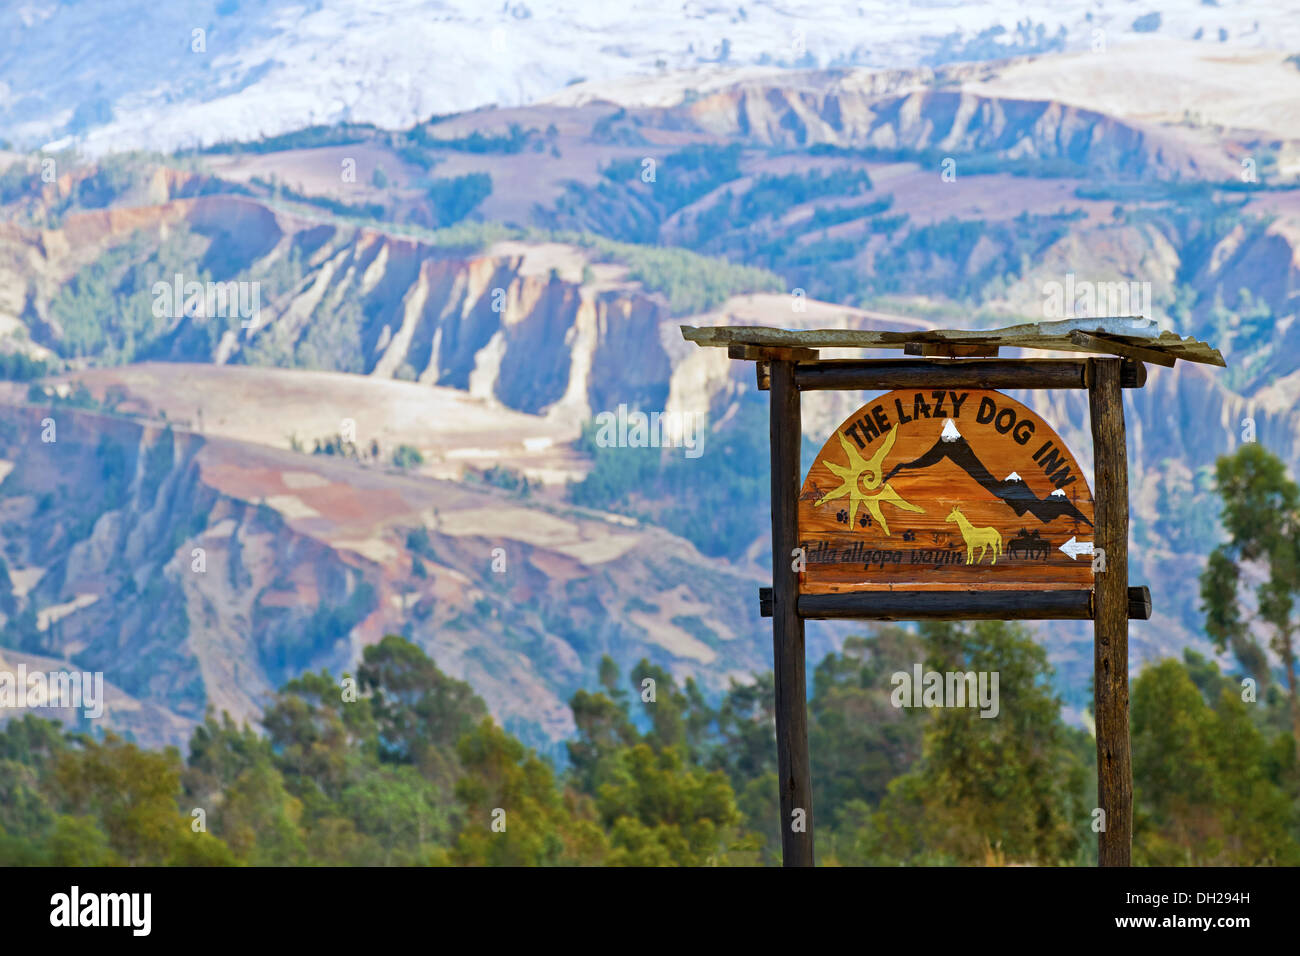 Lazy Dog Inn mountain retreat near Huaraz in the Peruvian Andes, South America. - Stock Image